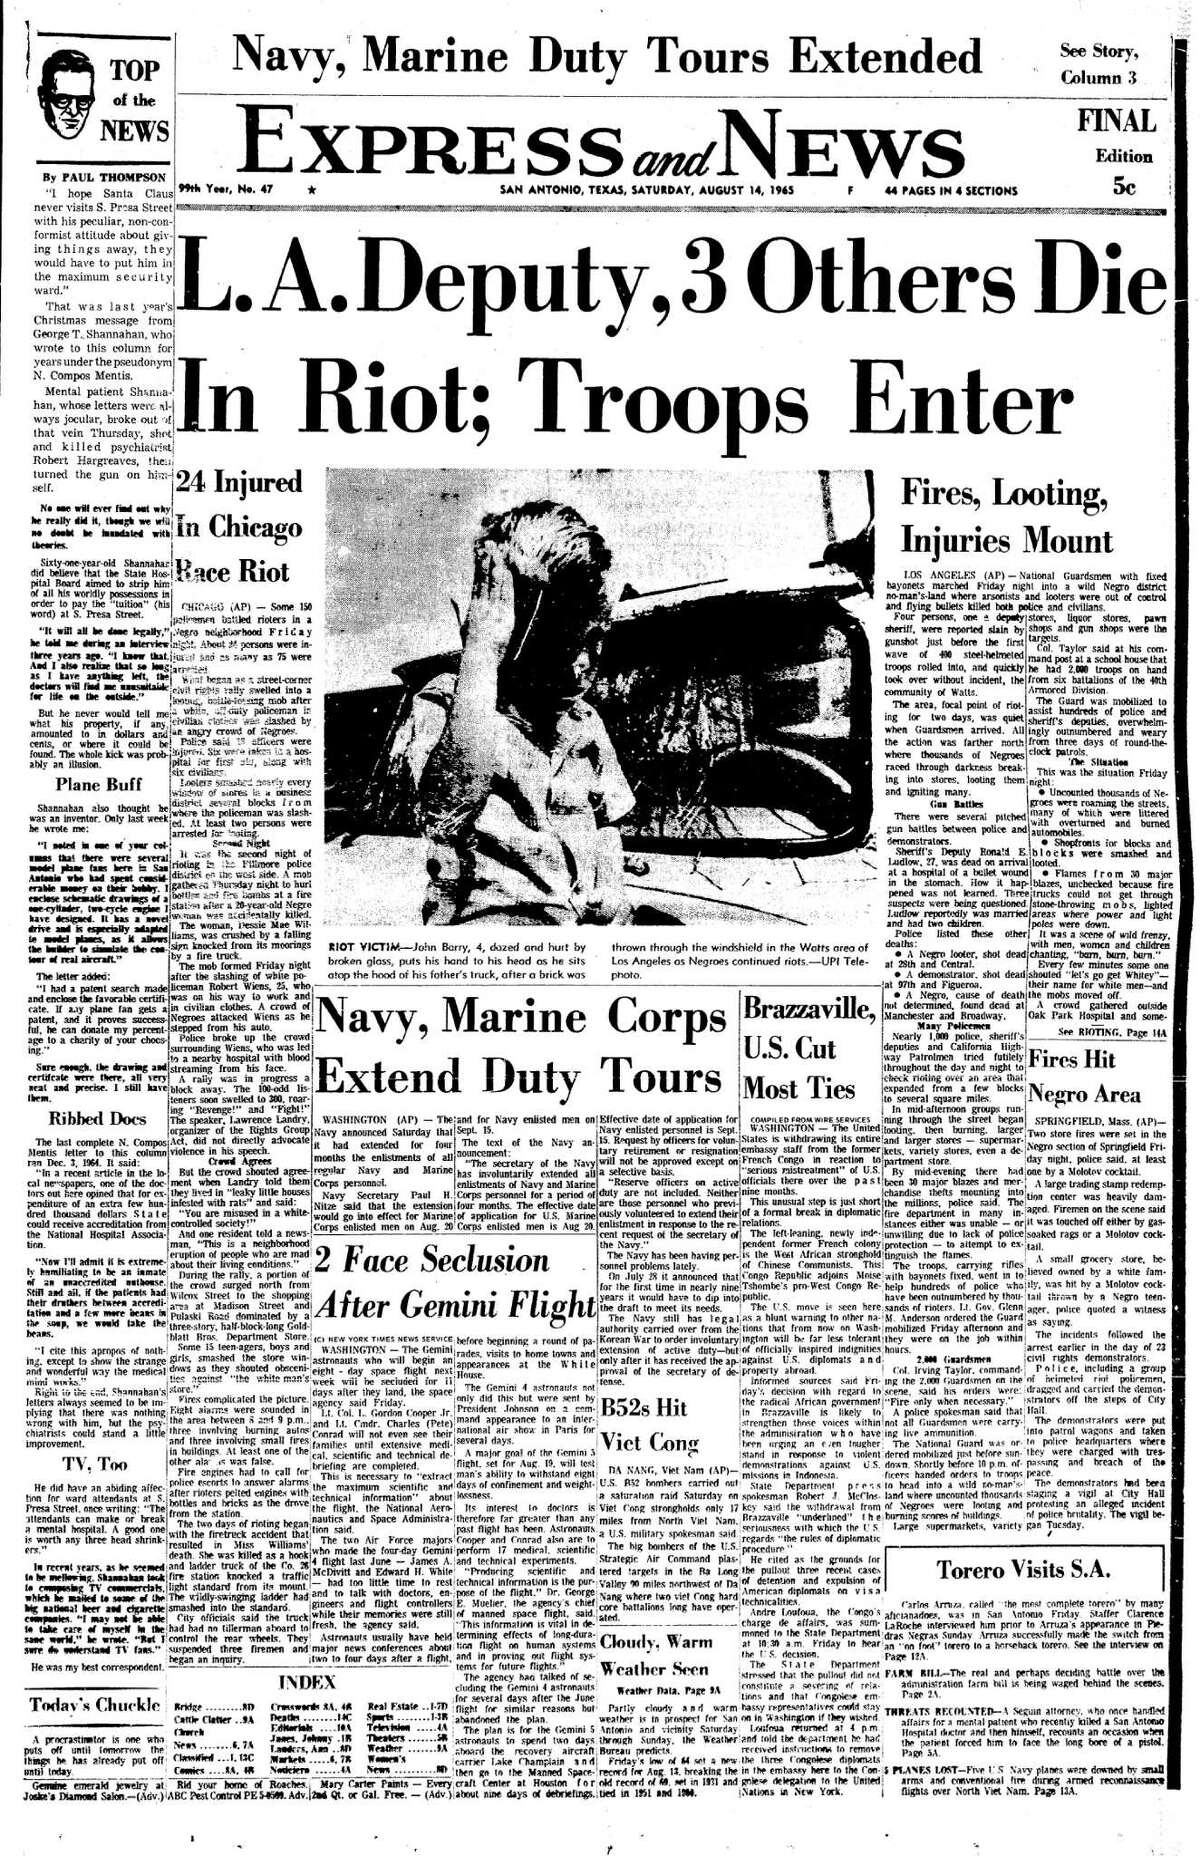 Aug. 14, 1965